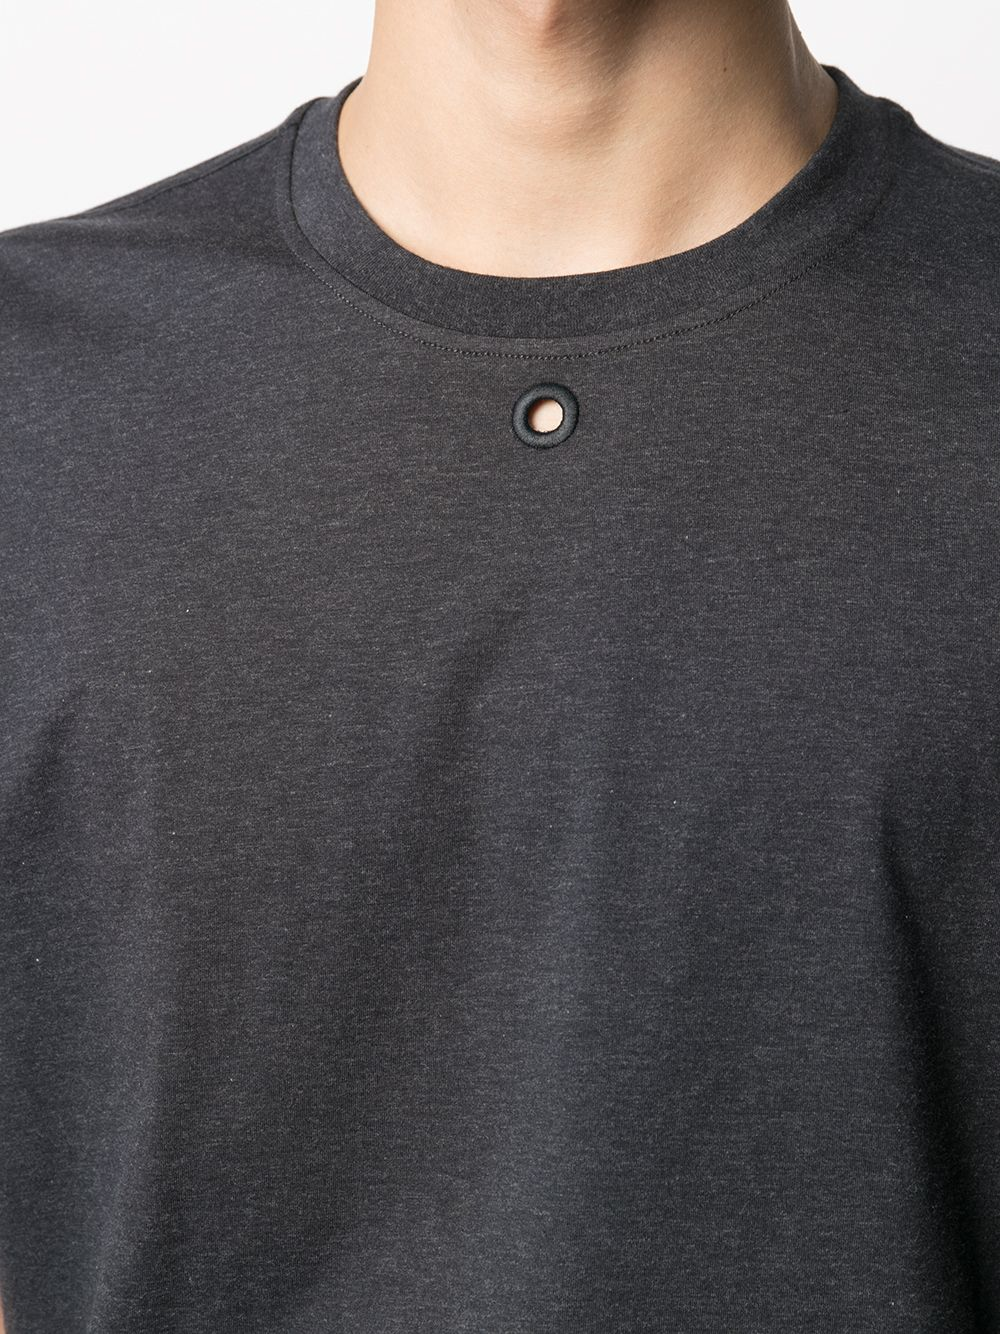 Craig Green t-shirt in cotone uomo CRAIG GREEN | T-shirt | CGSS21CJETSS02DARK GREY